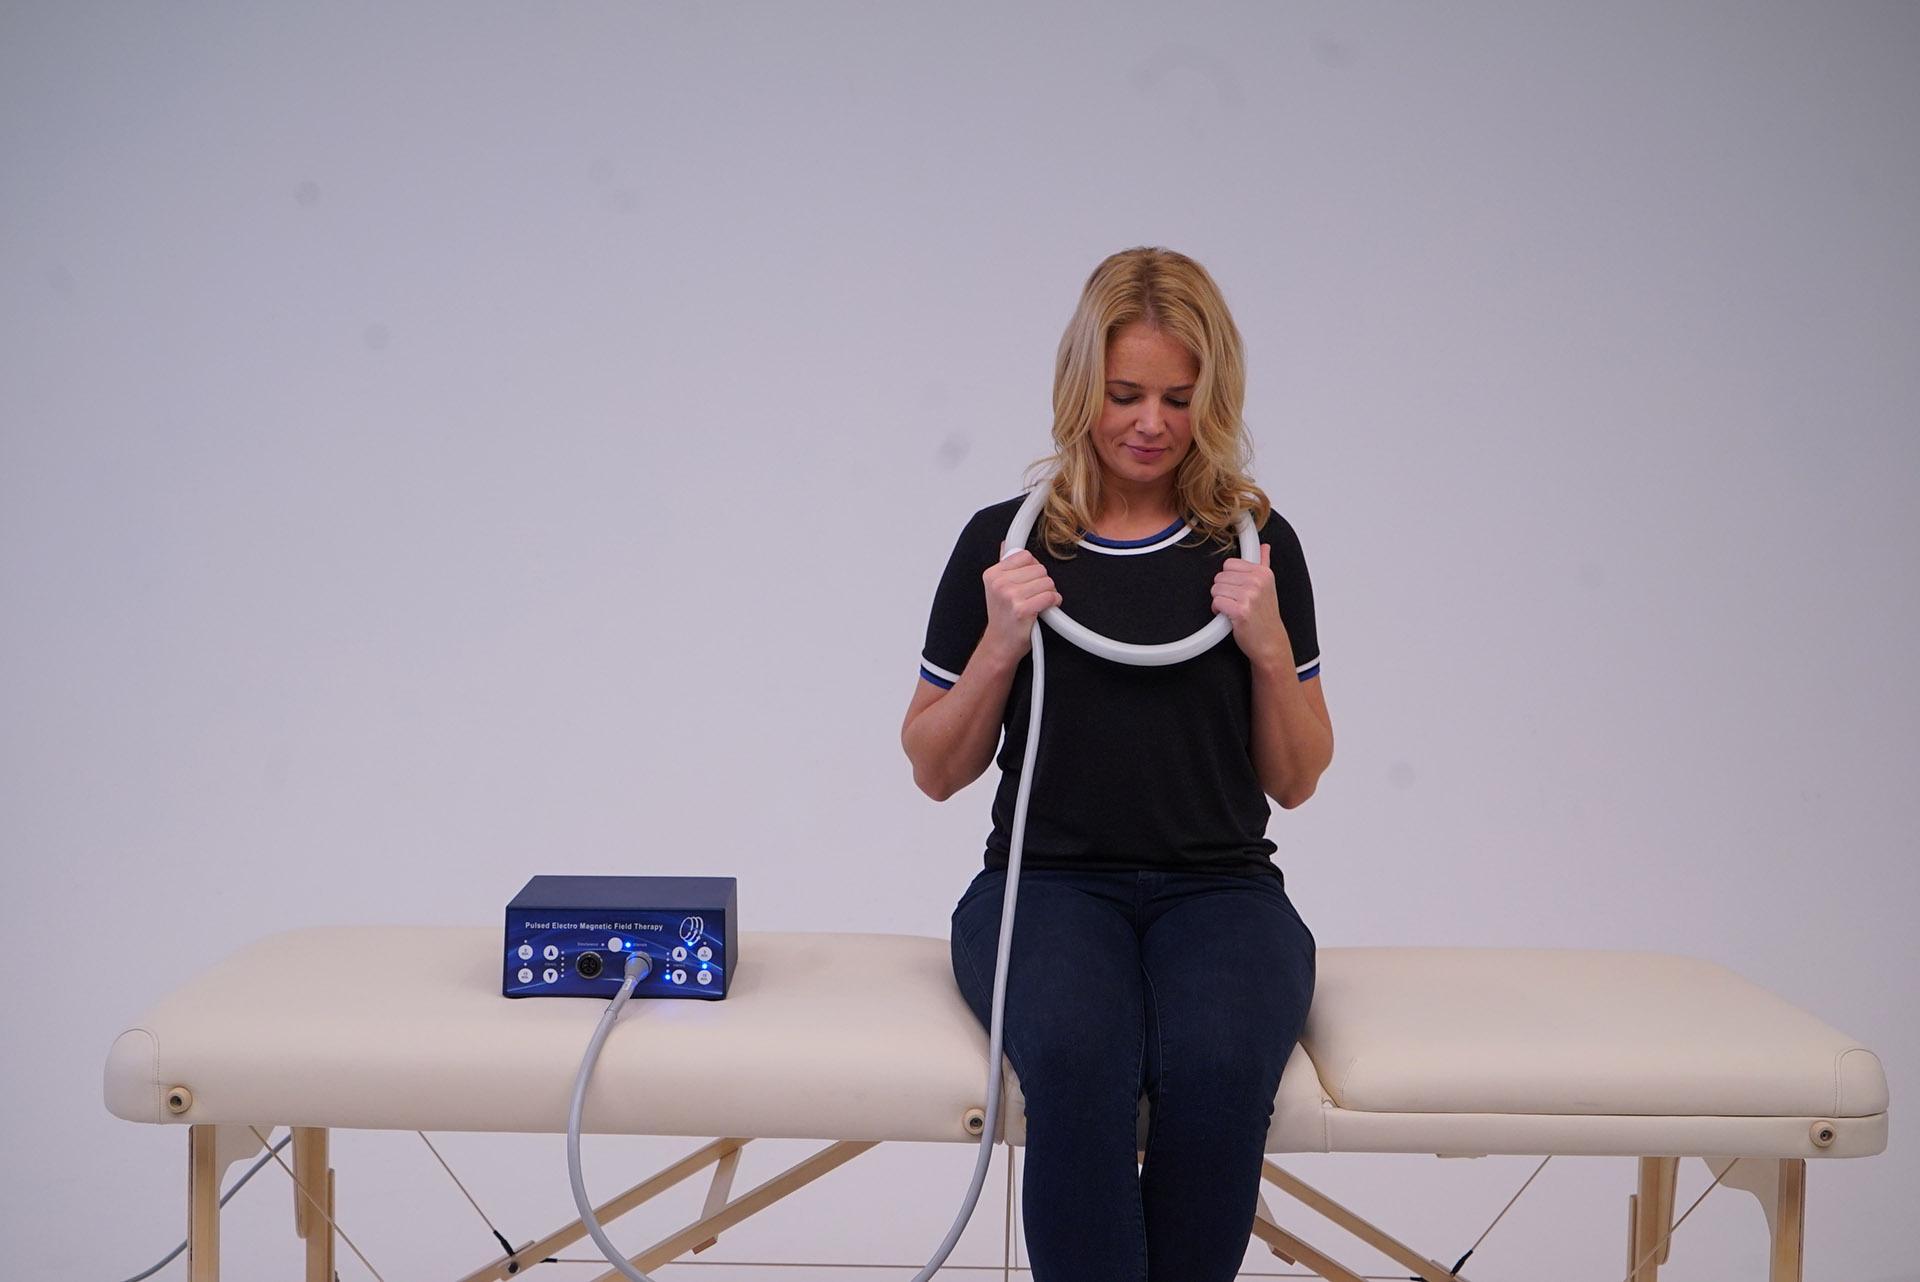 PEMF therapy neck TeslaFit Duo Coil Loop